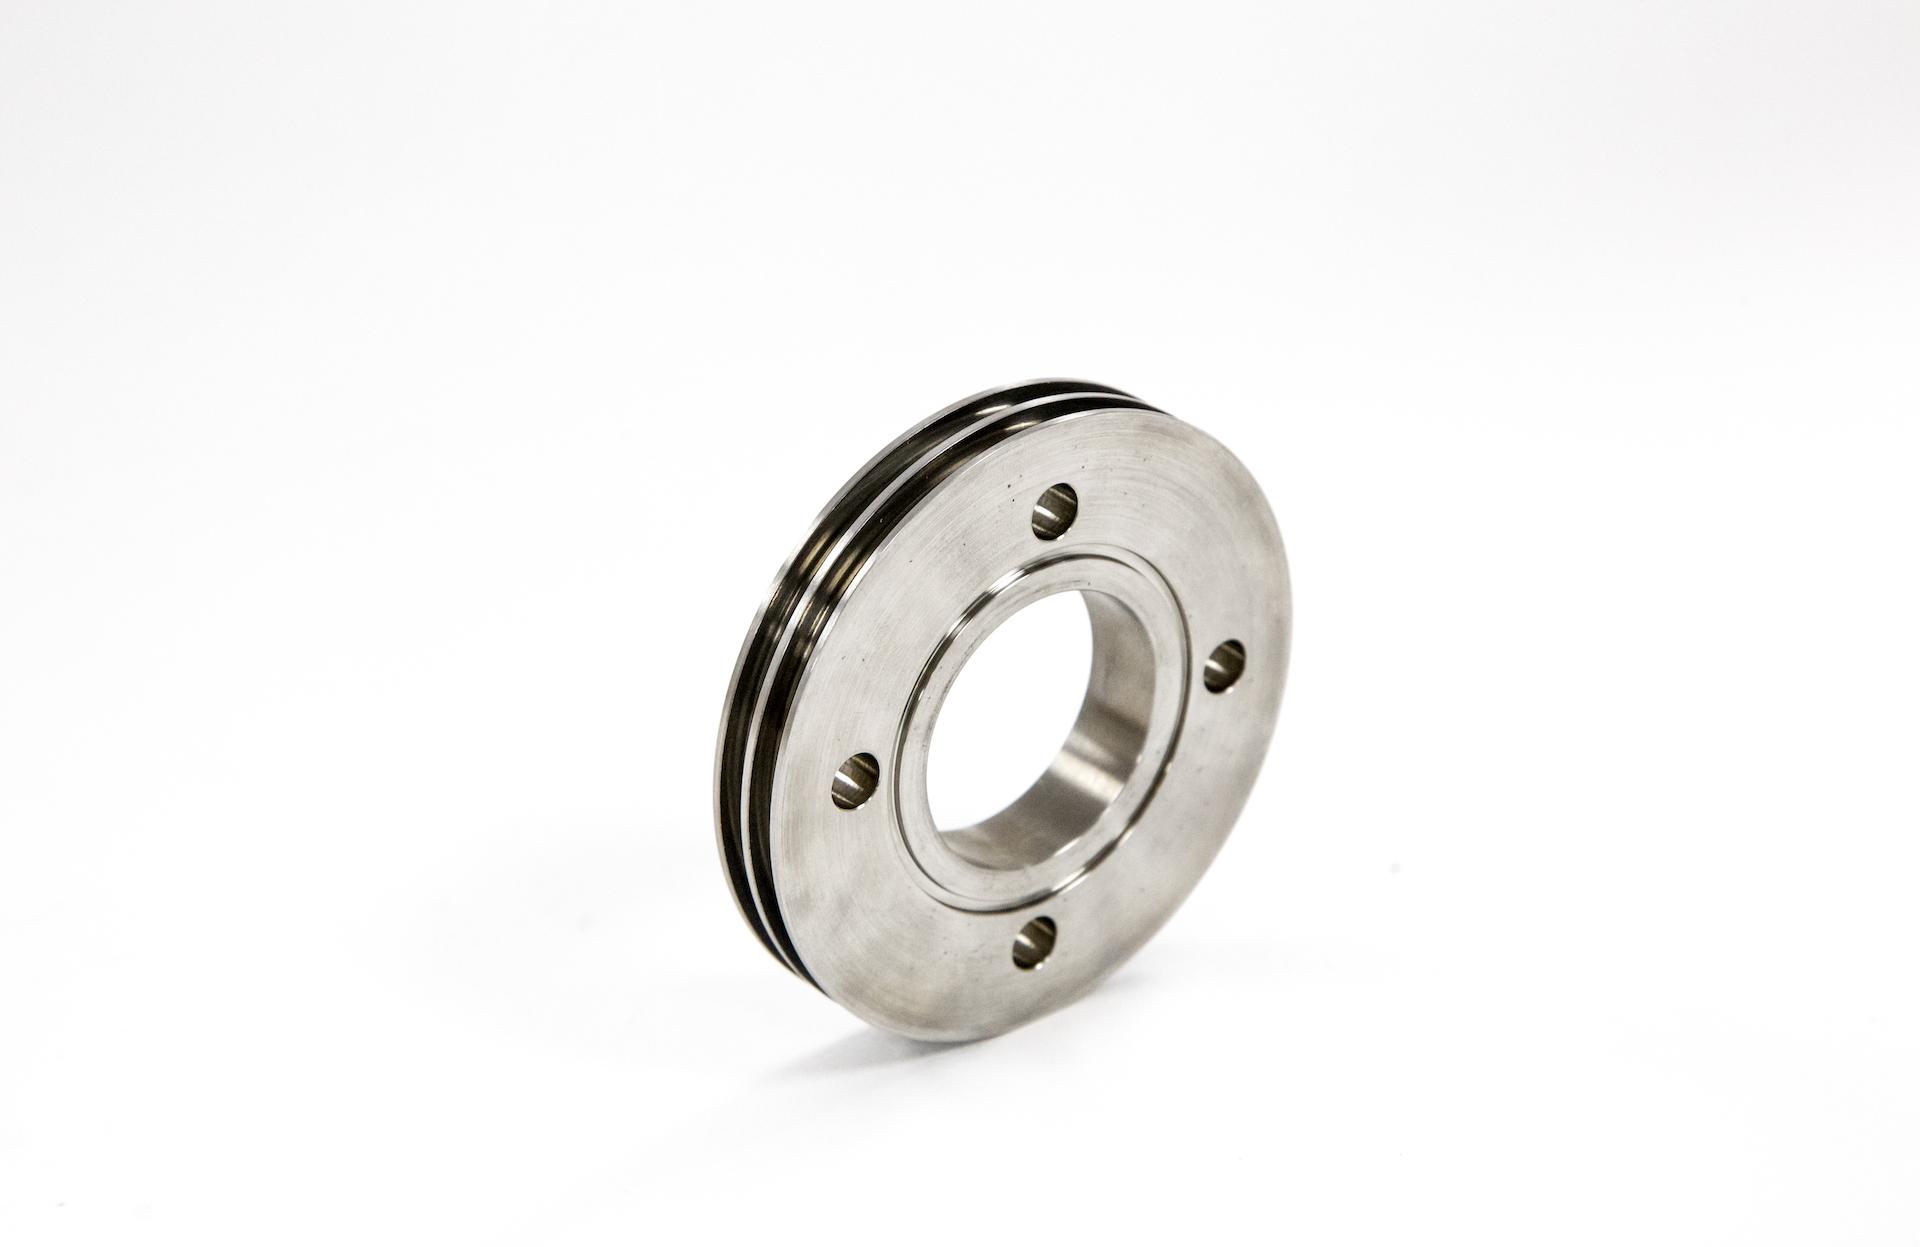 https://www.taylor-engineering.co.uk/wp-content/uploads/capabilities/turning/doosan-2100gt-parts.jpg